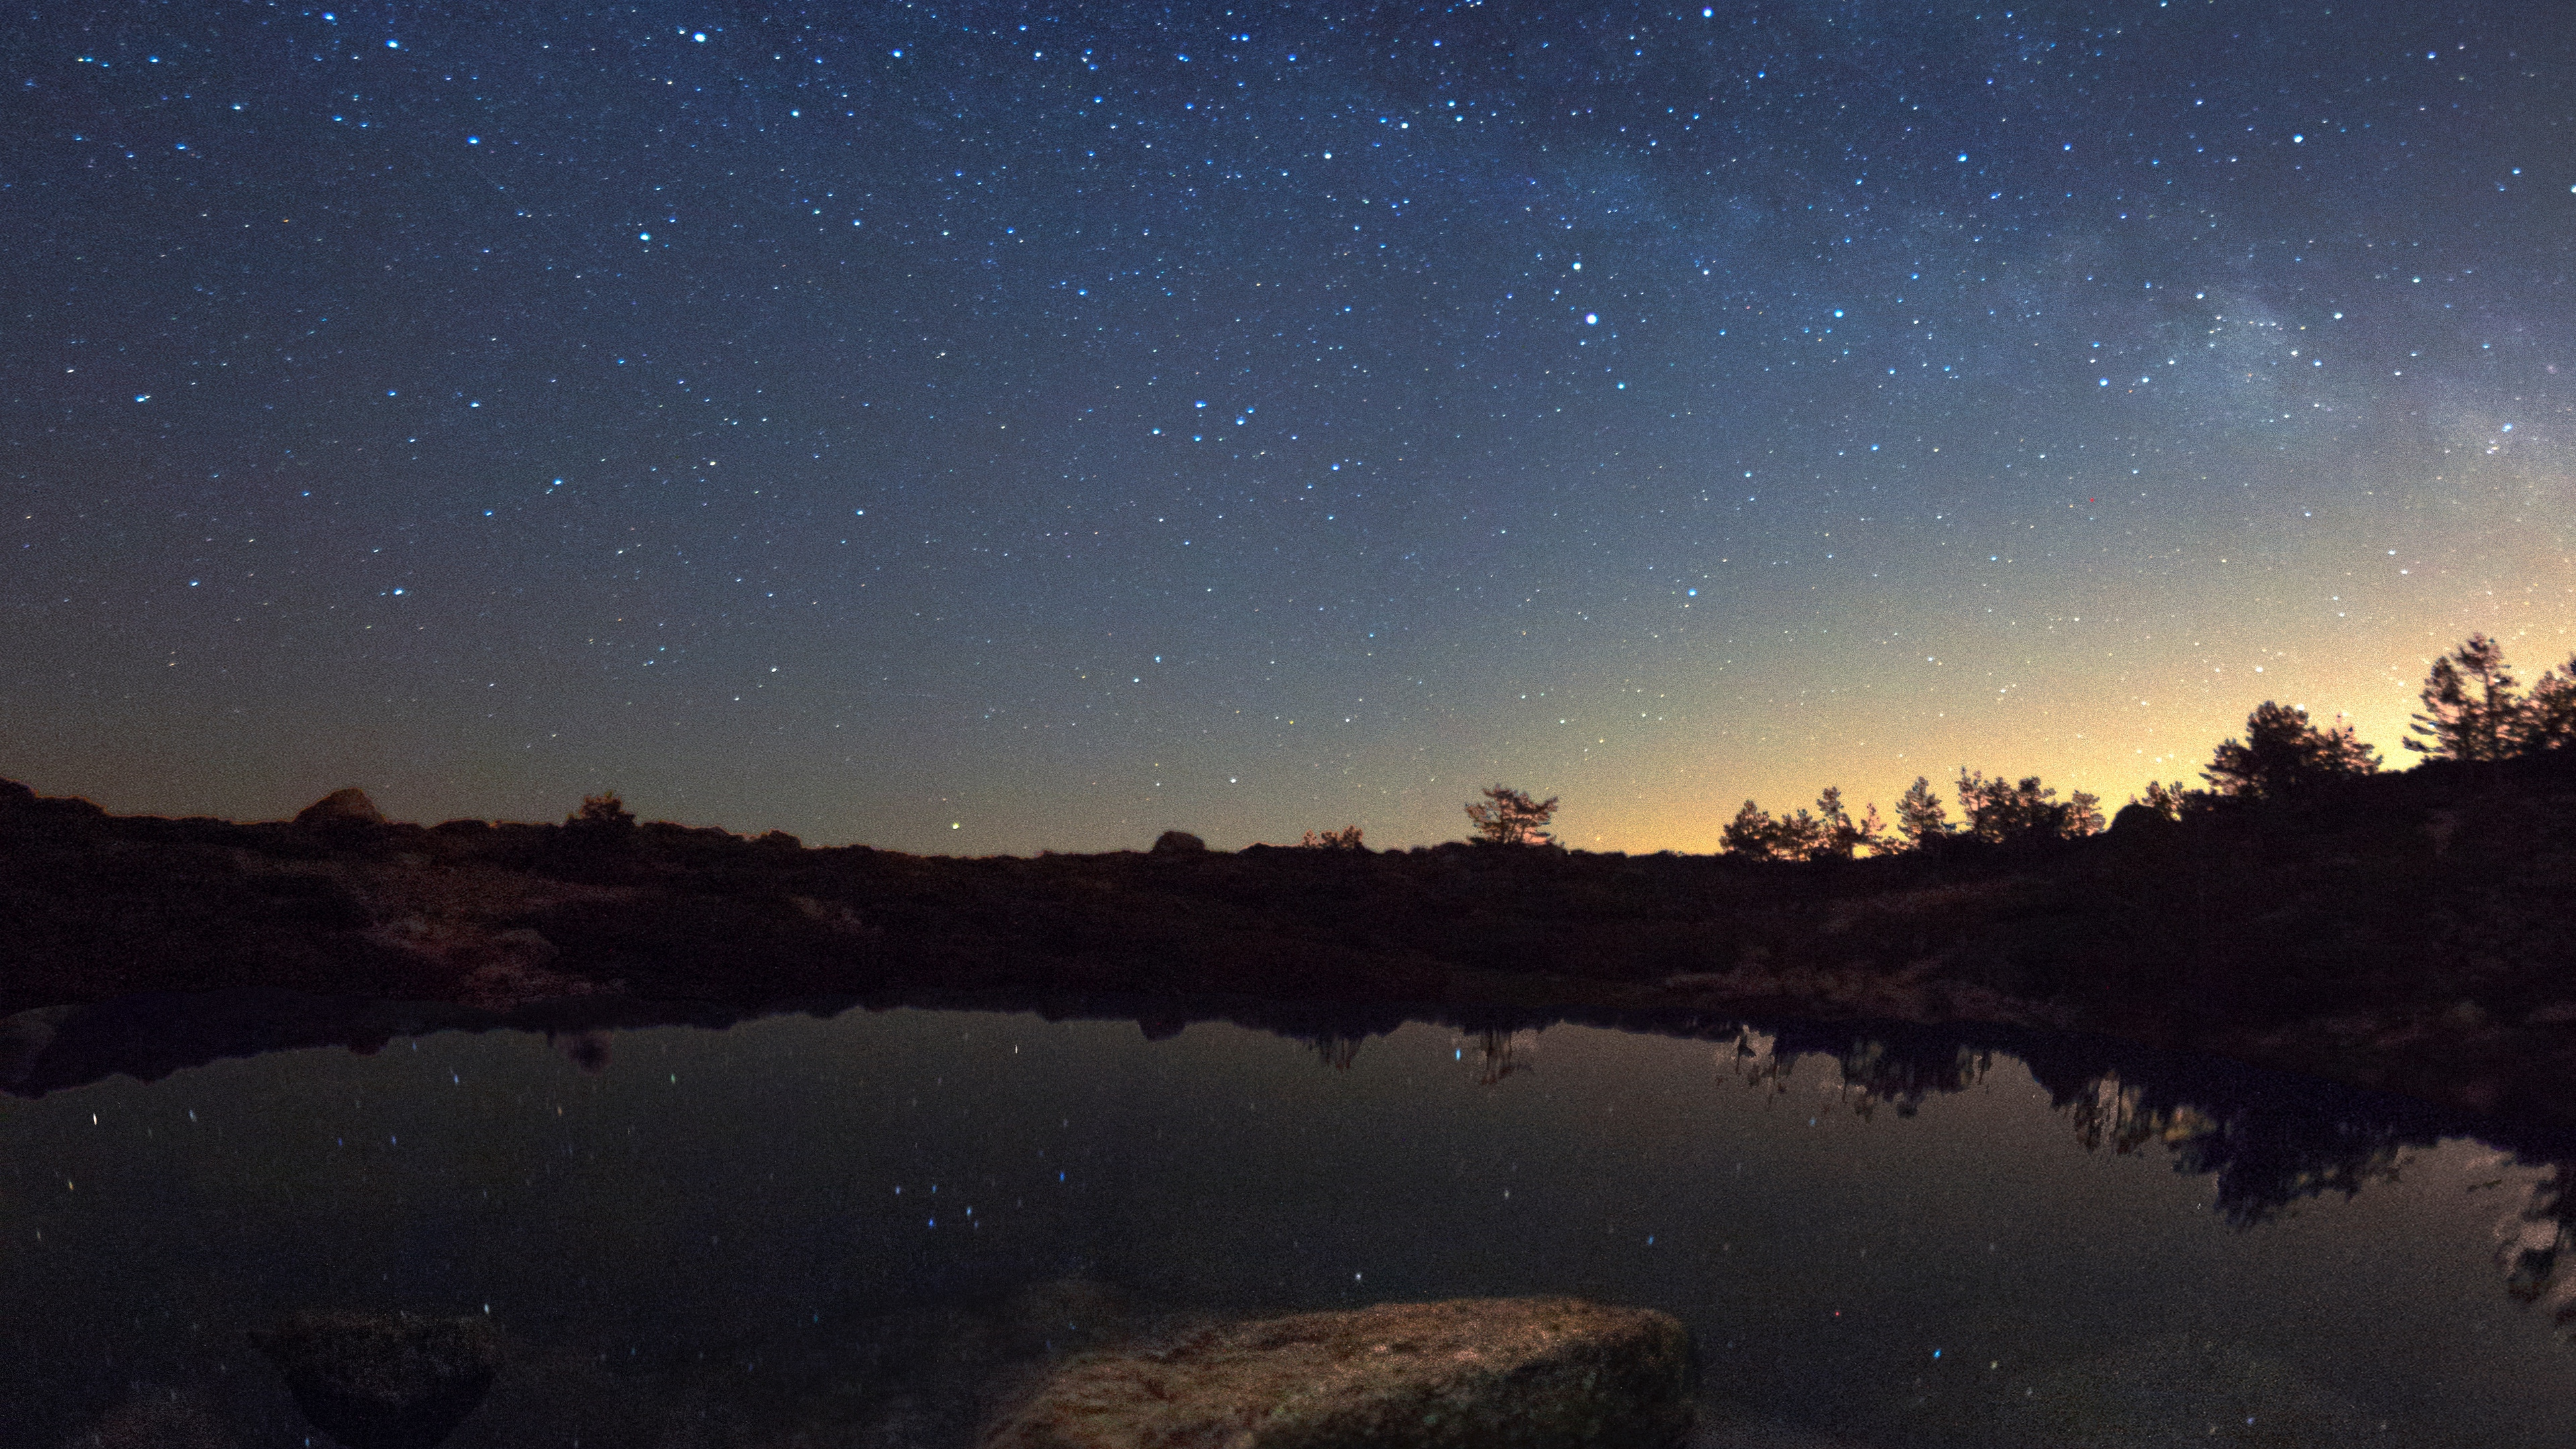 starry sky lake night horizon reflection 4k 1541113678 - starry sky, lake, night, horizon, reflection 4k - starry sky, Night, Lake